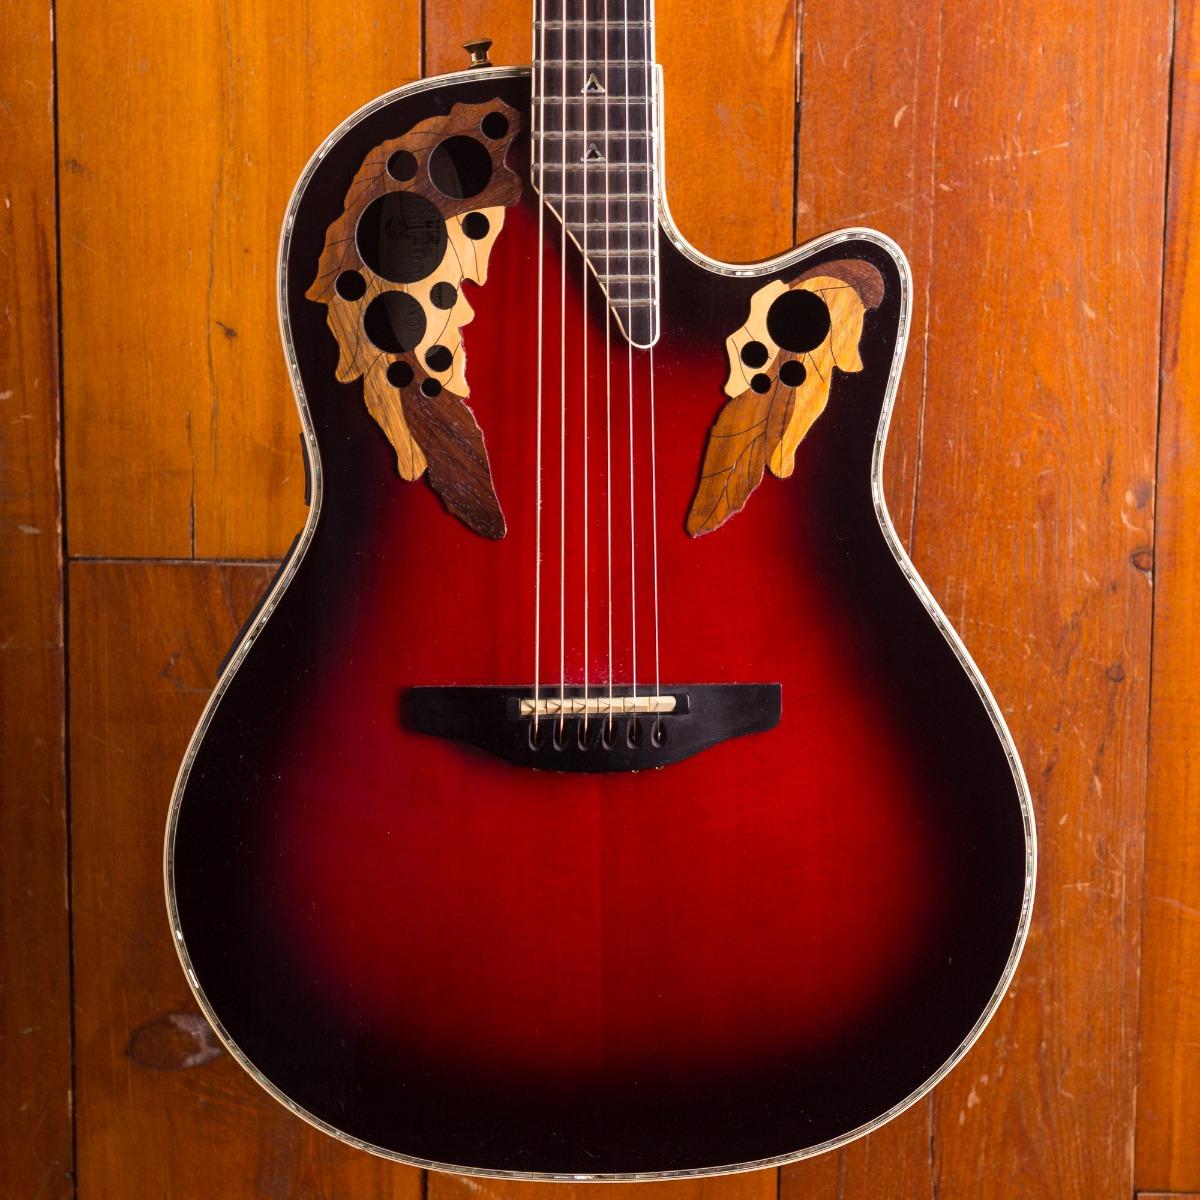 Ovation Guitars Shallow bowl CE 868 Custom Elite USA